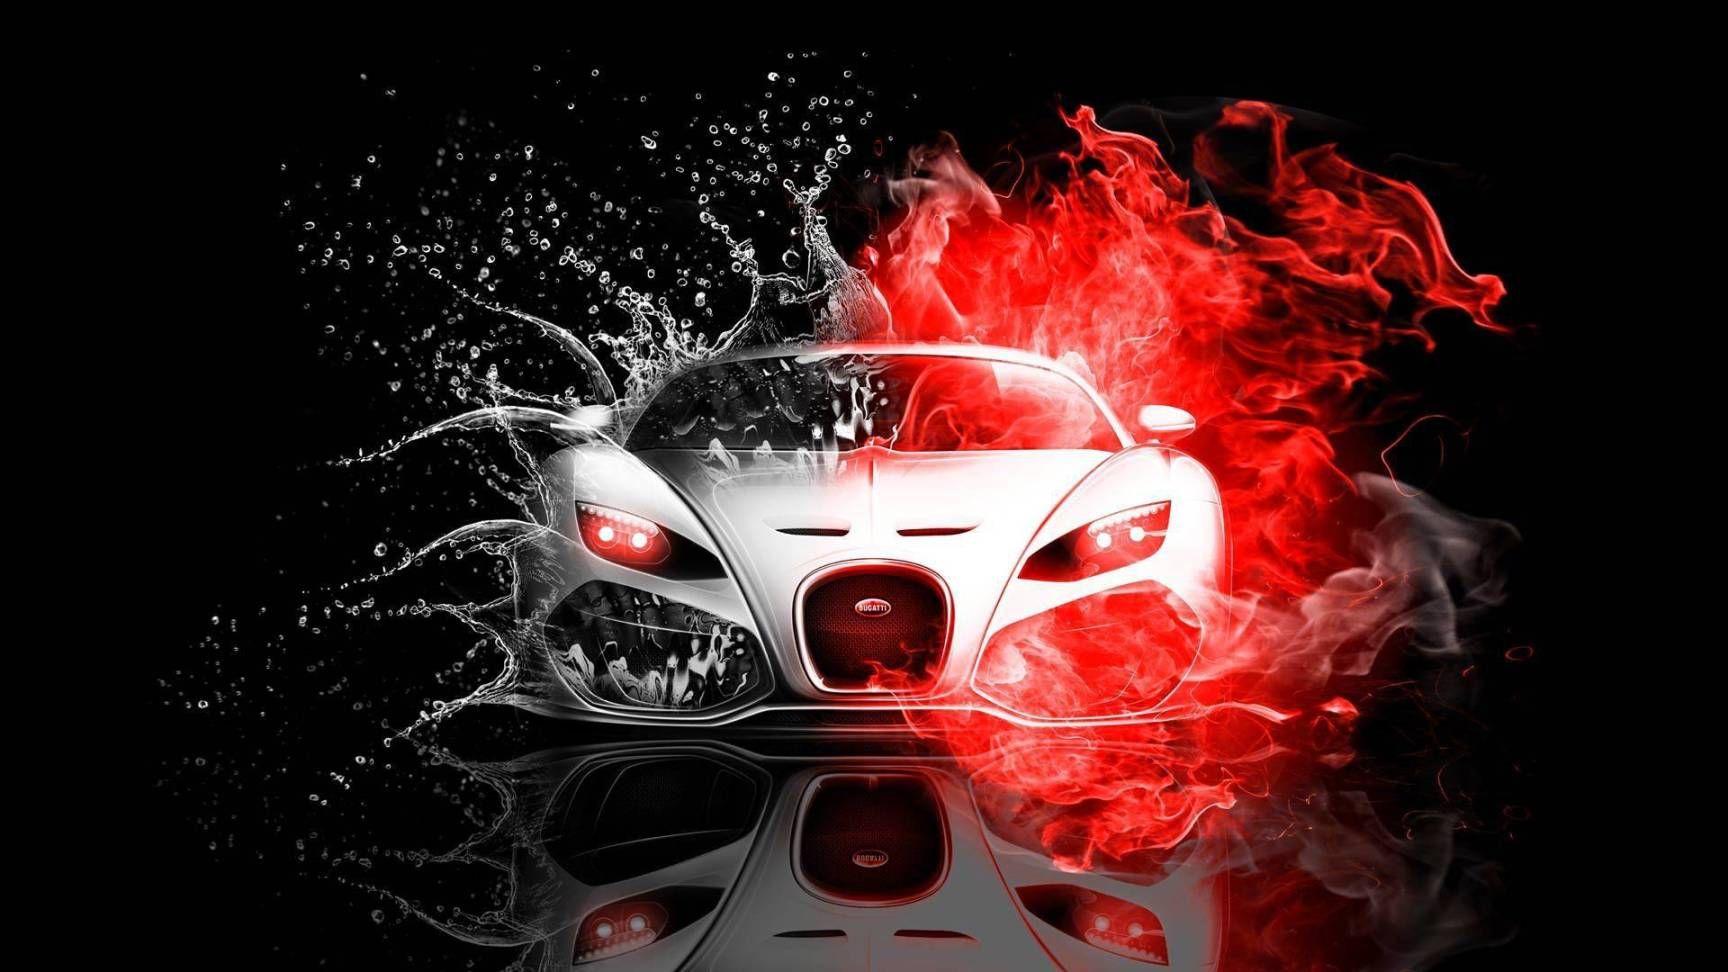 Bugatti Veyron Water Fire Wallpaper